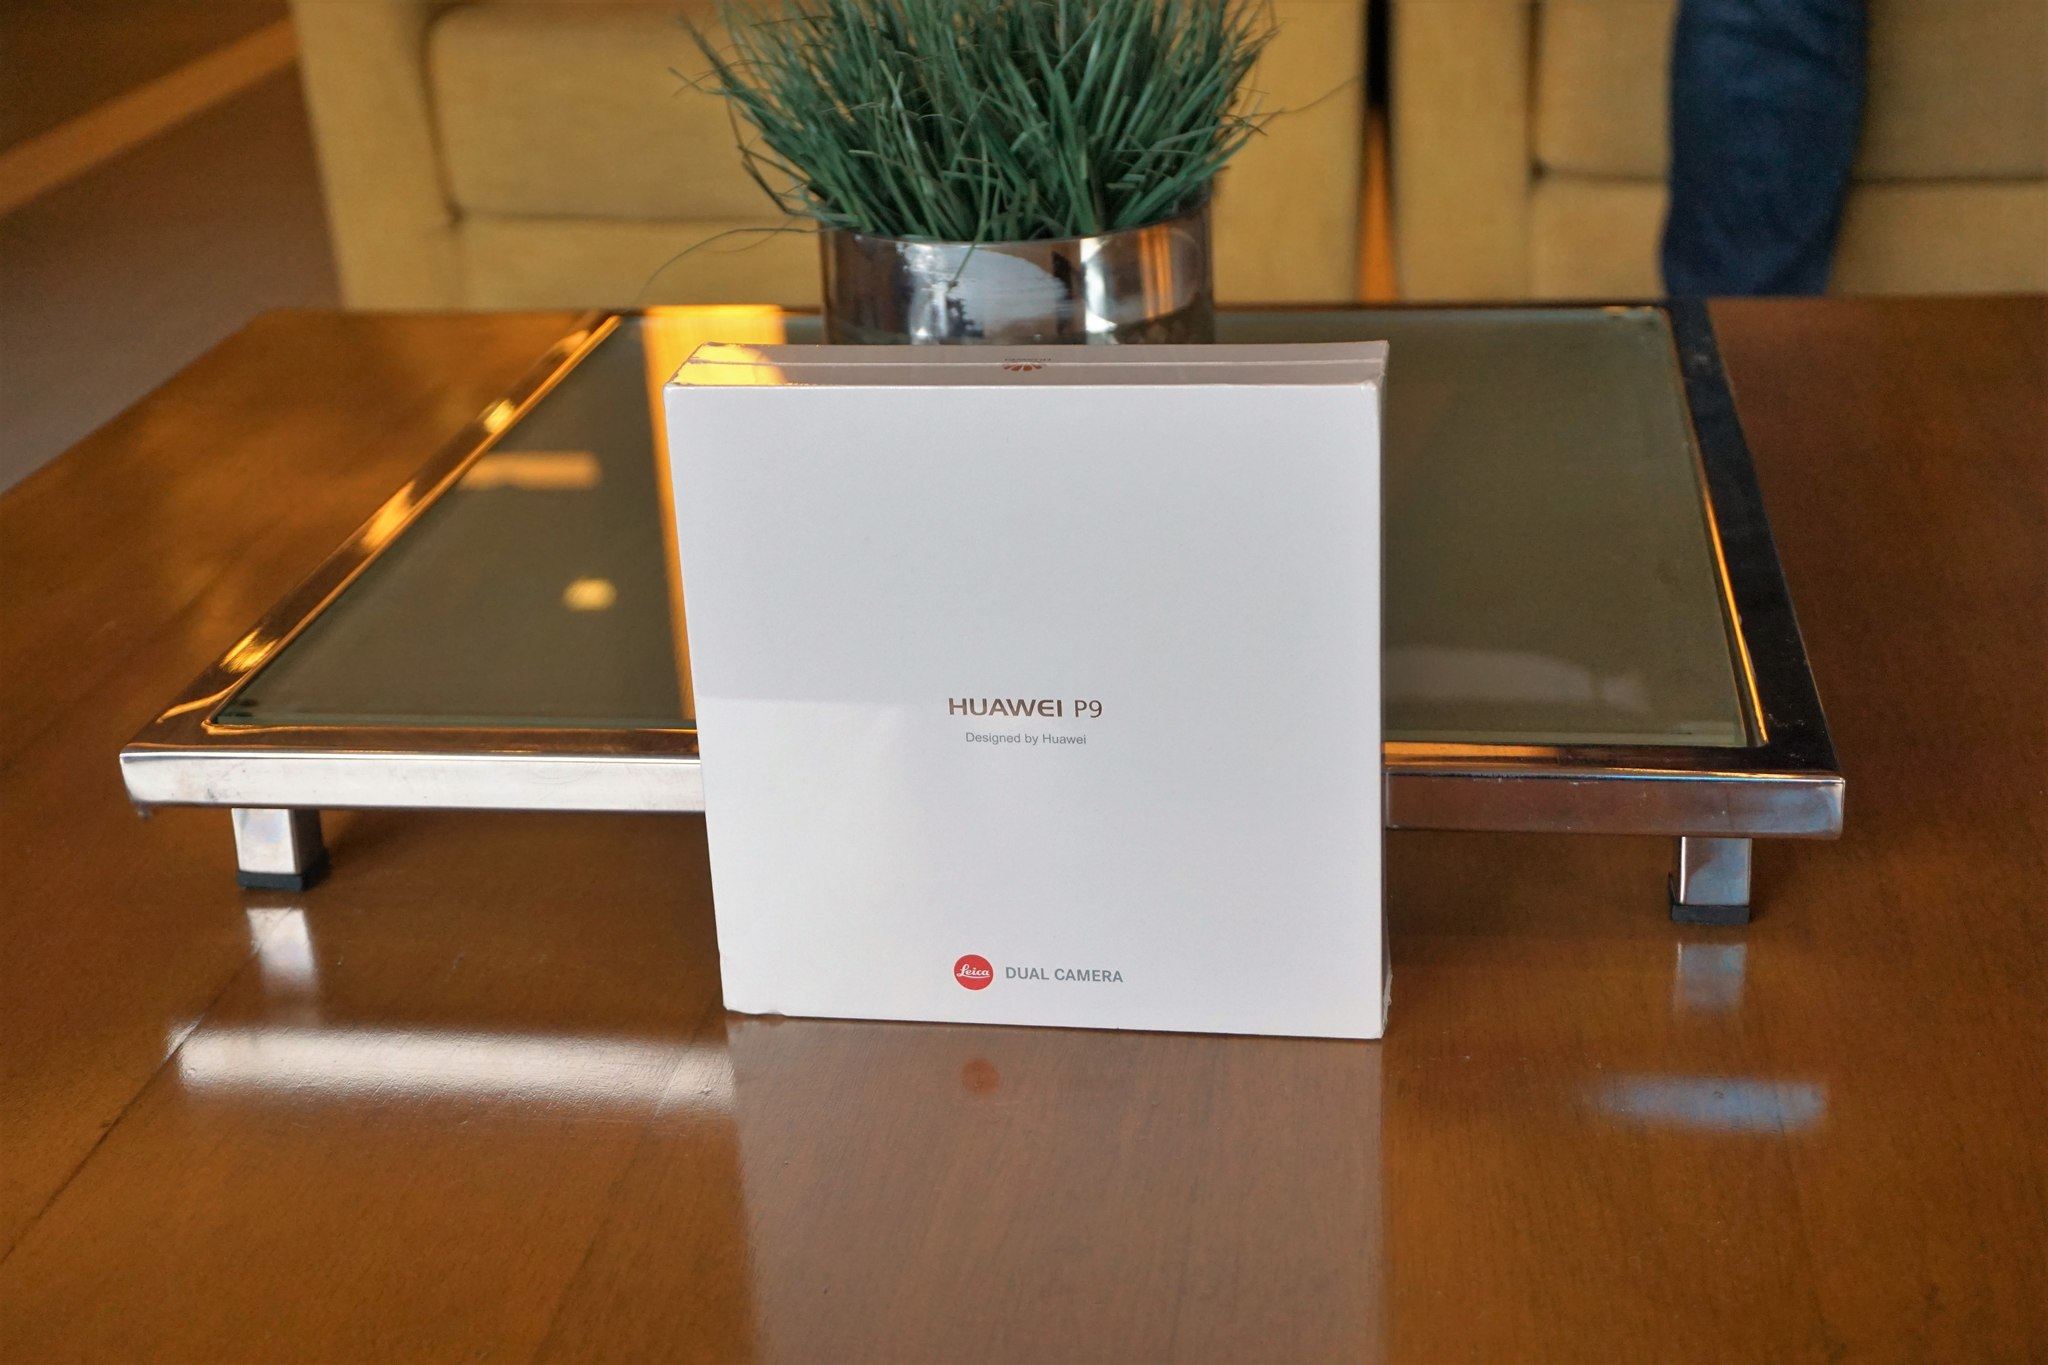 Huawei P9 packaging